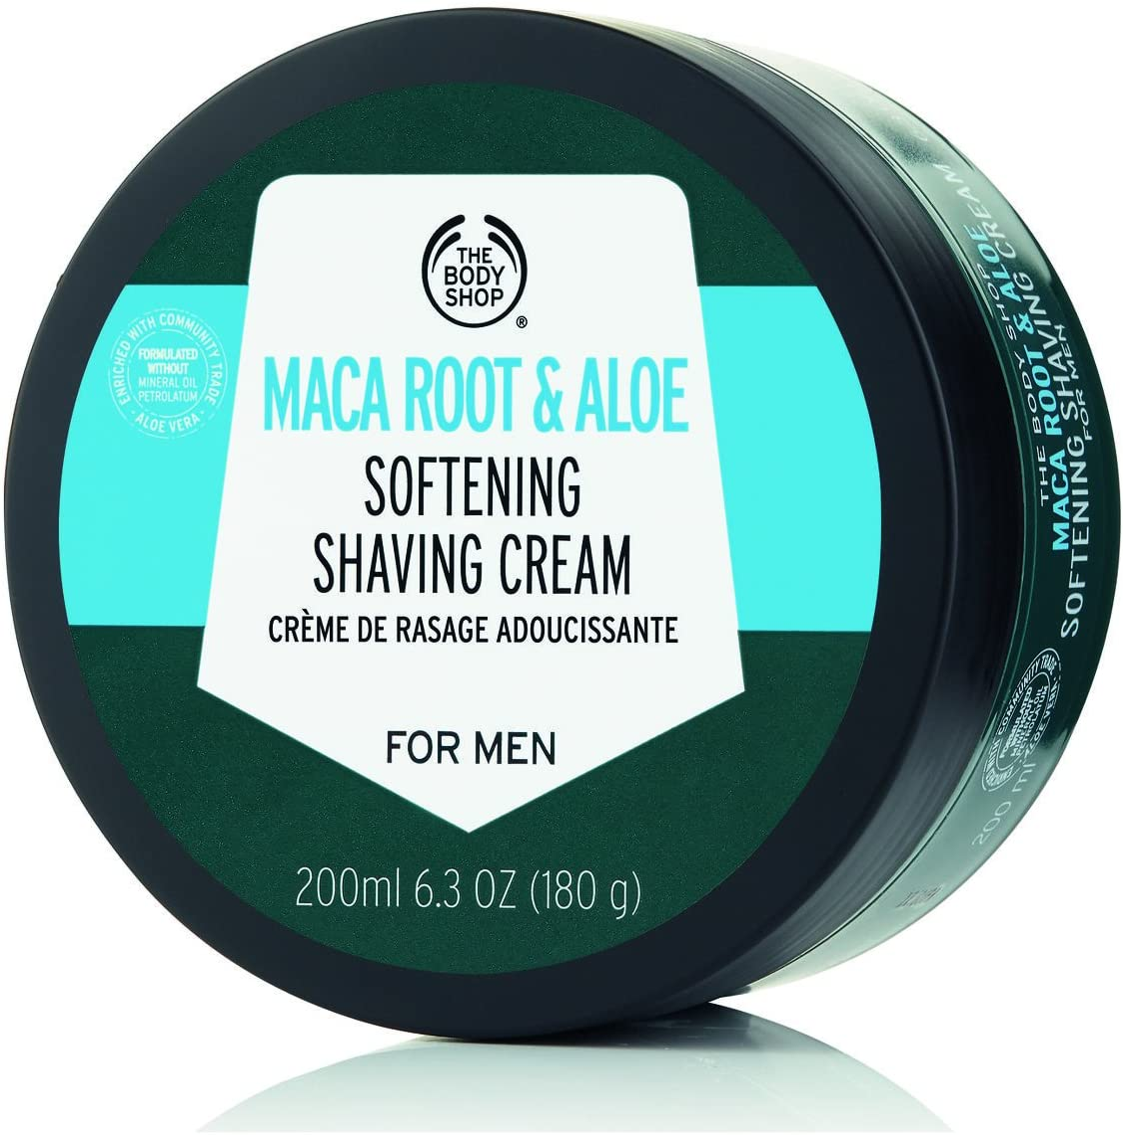 The Body Shop - Crema de afeitar de raíz de maca y aloe para ...